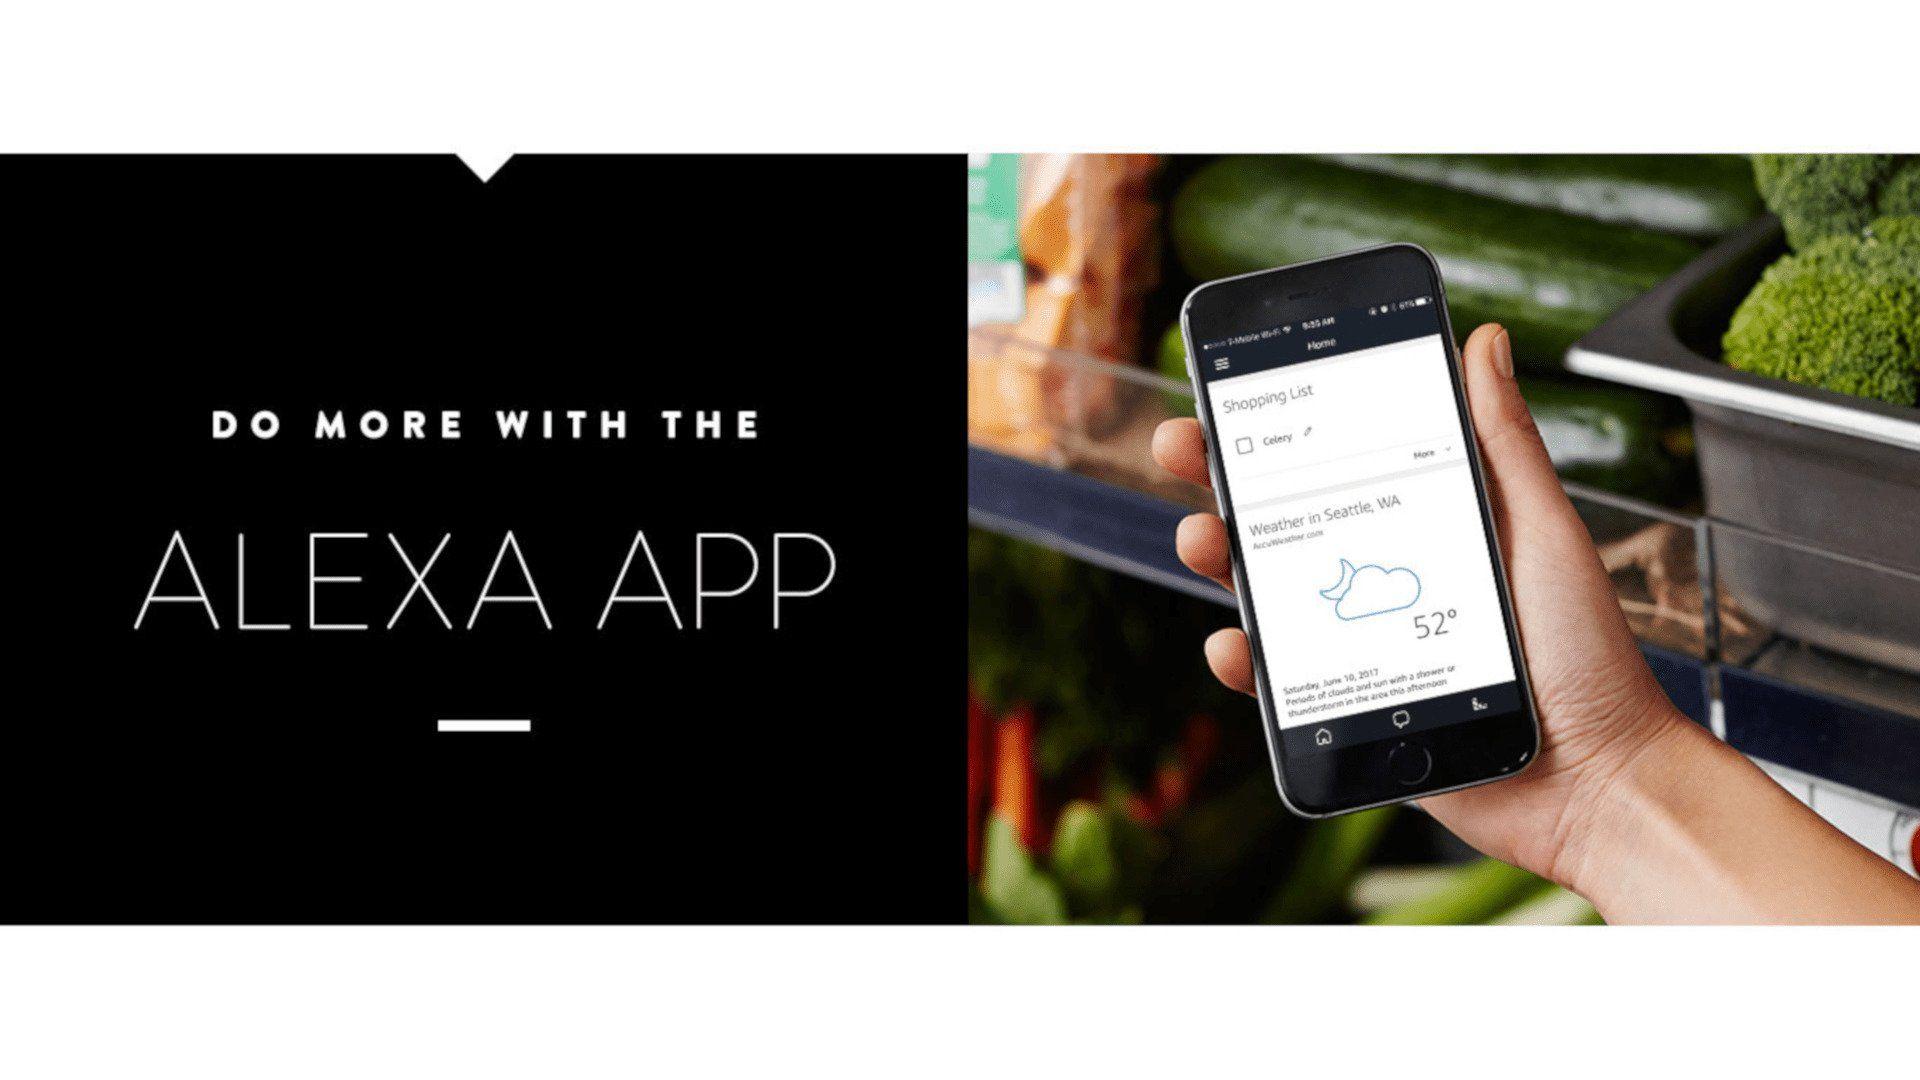 Amazon Alexa app finally gets Voice Control feature on iOS